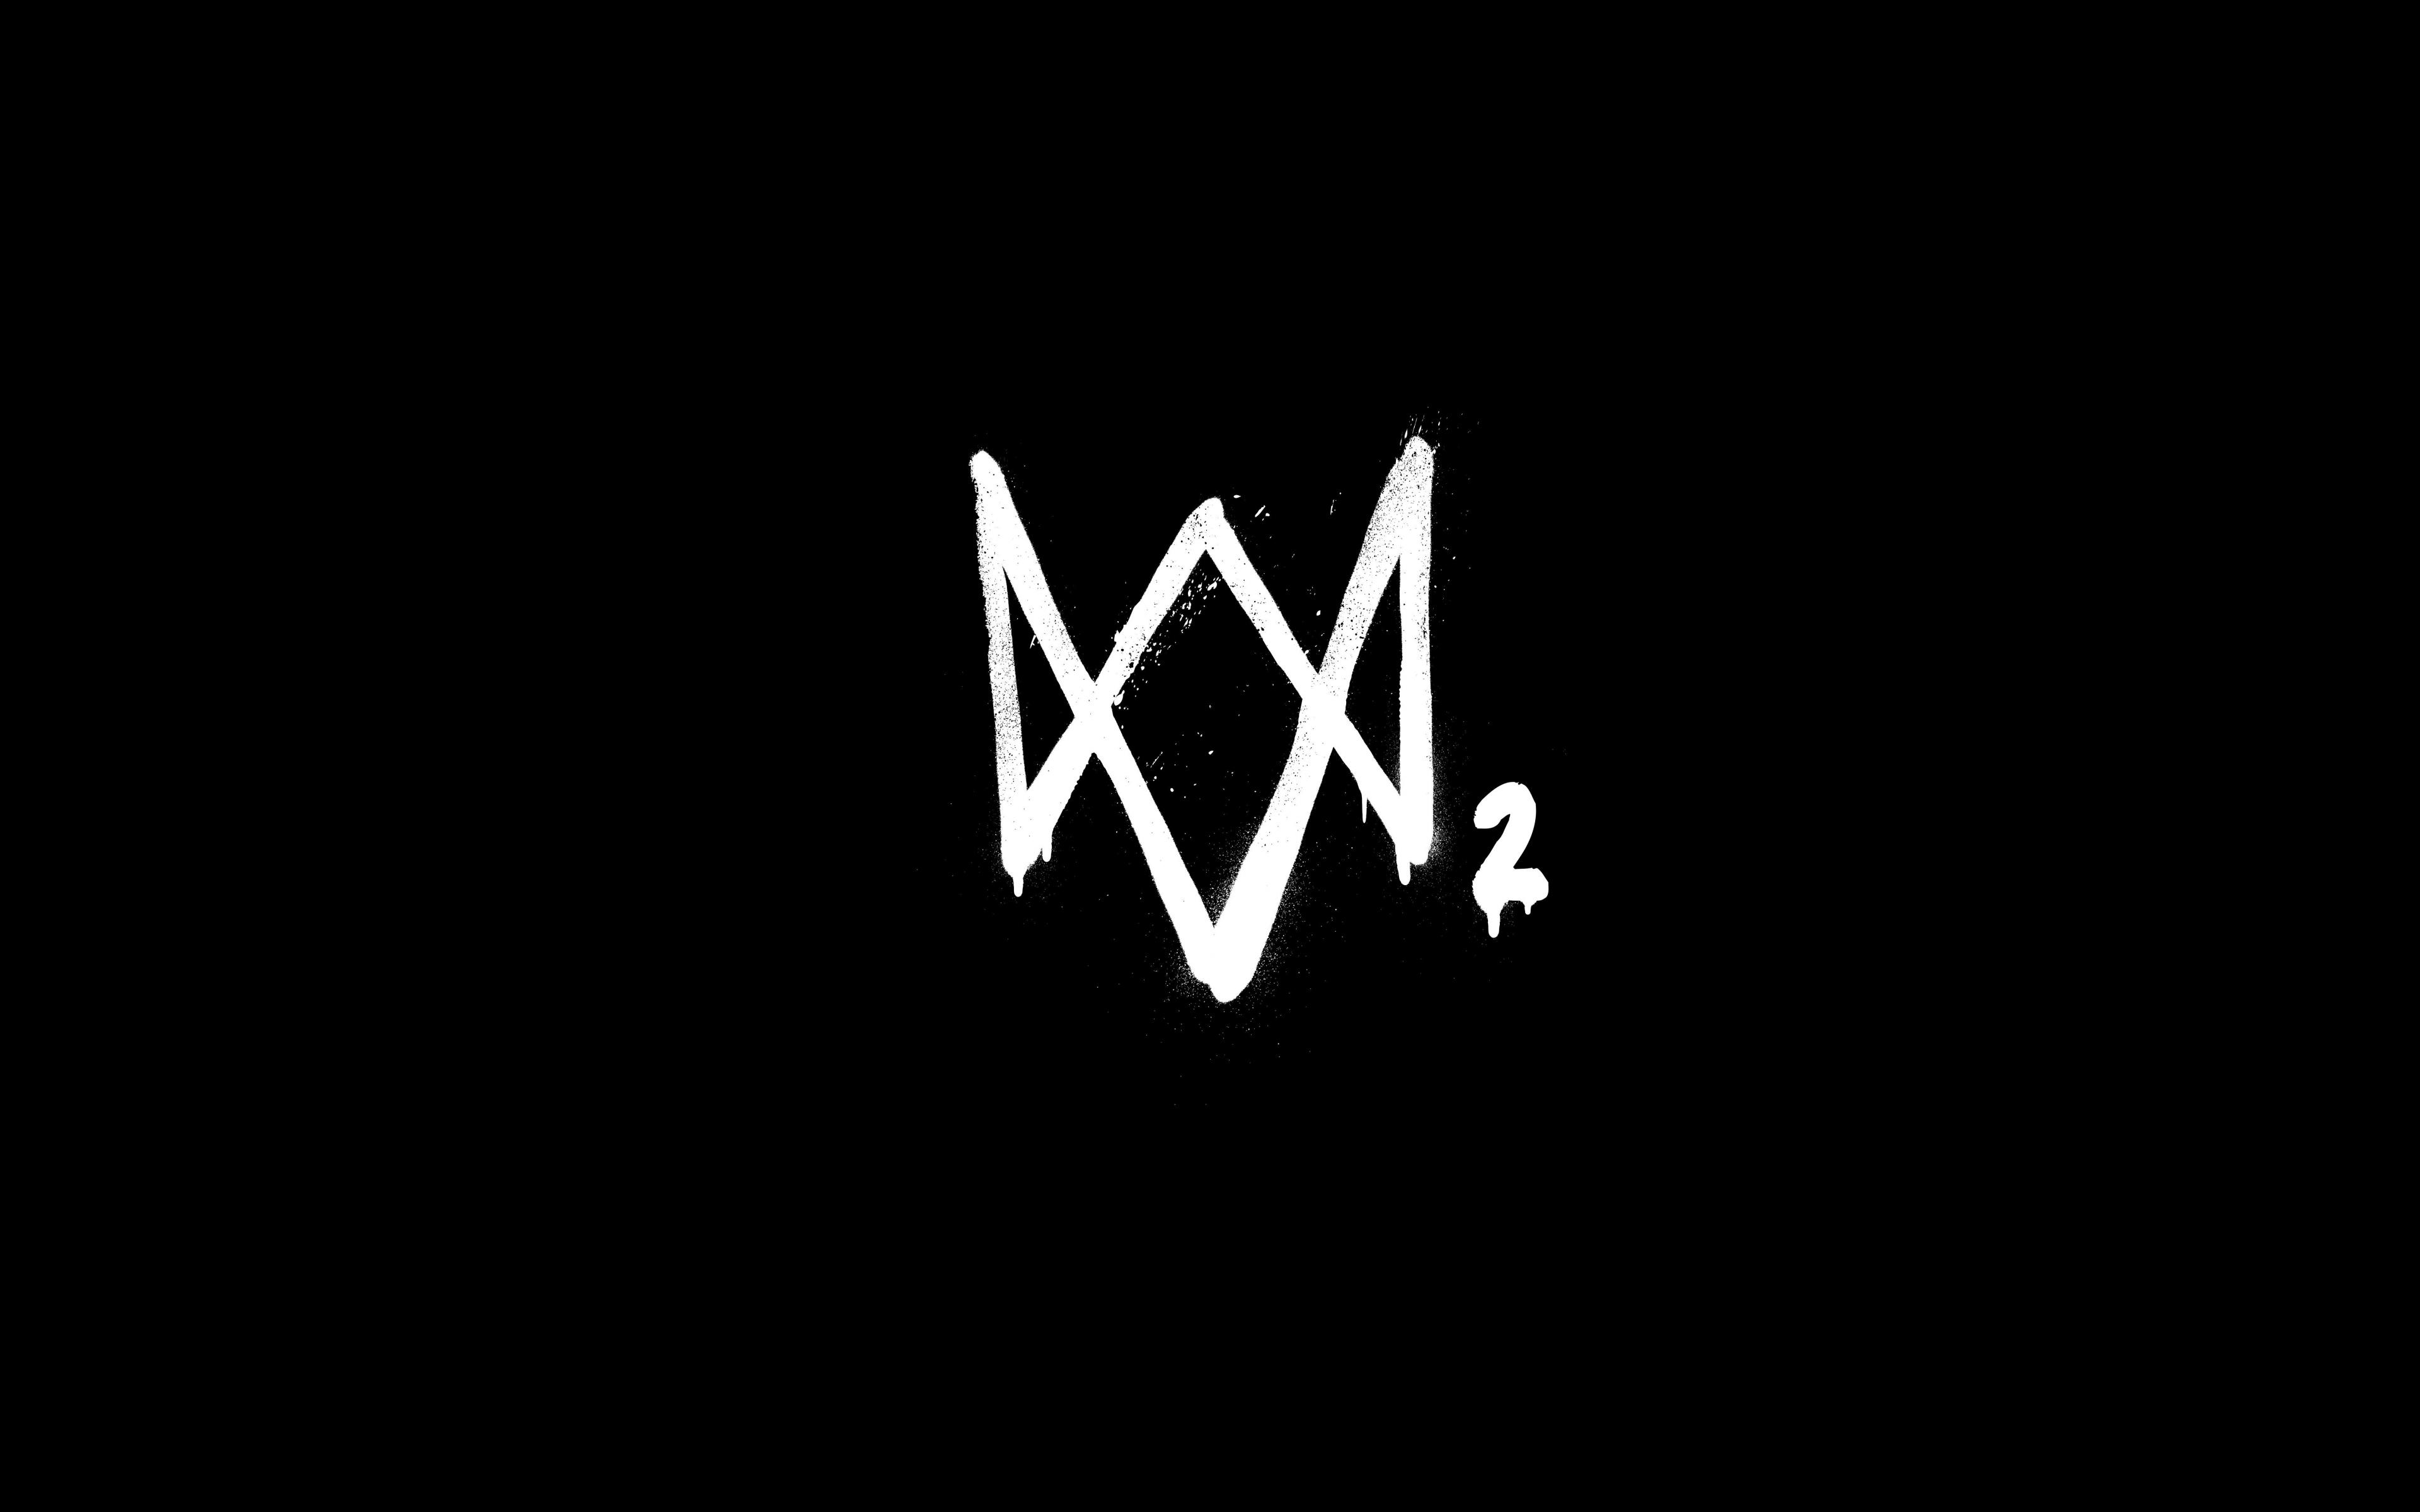 Download 3840x2400 Wallpaper Watch Dogs 2 Logo Minimal Dark 4 K